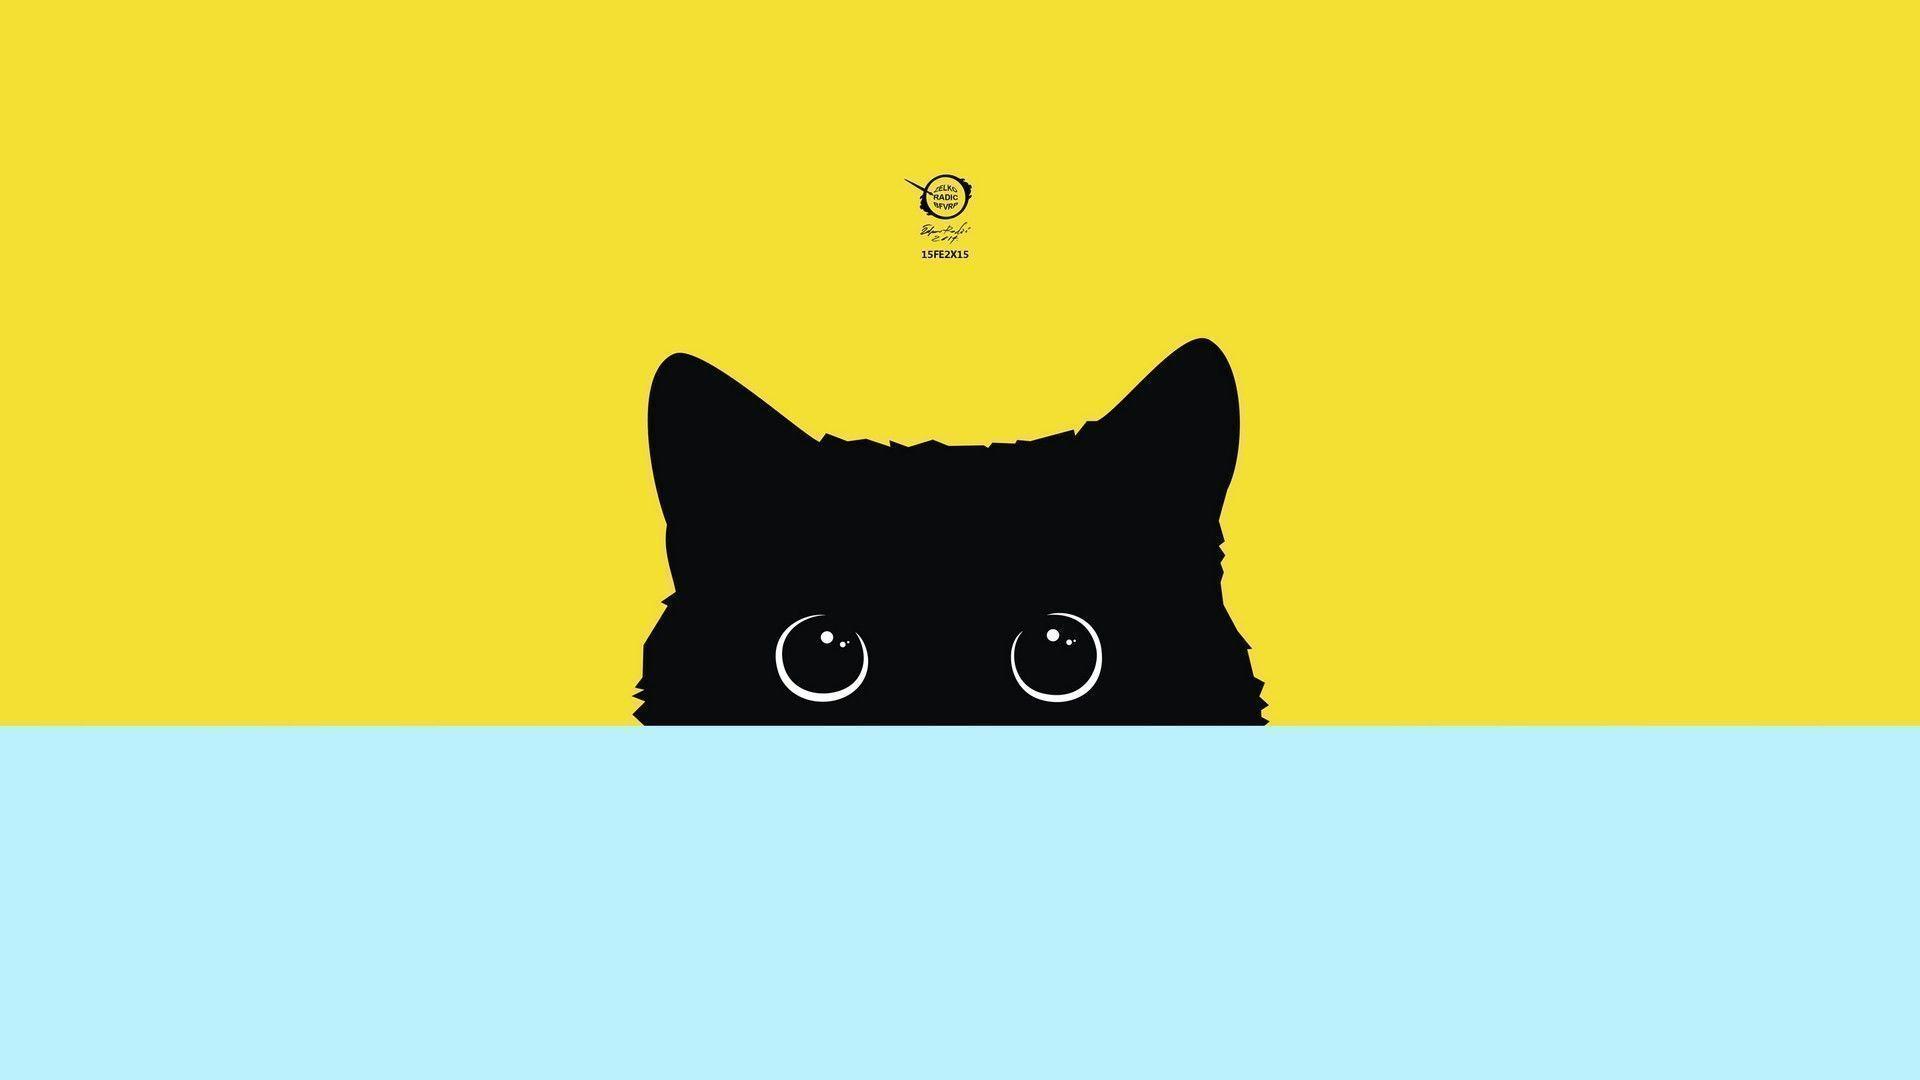 Kitten Kittens Cutest Cute Cat Wallpaper Kitten Wallpaper